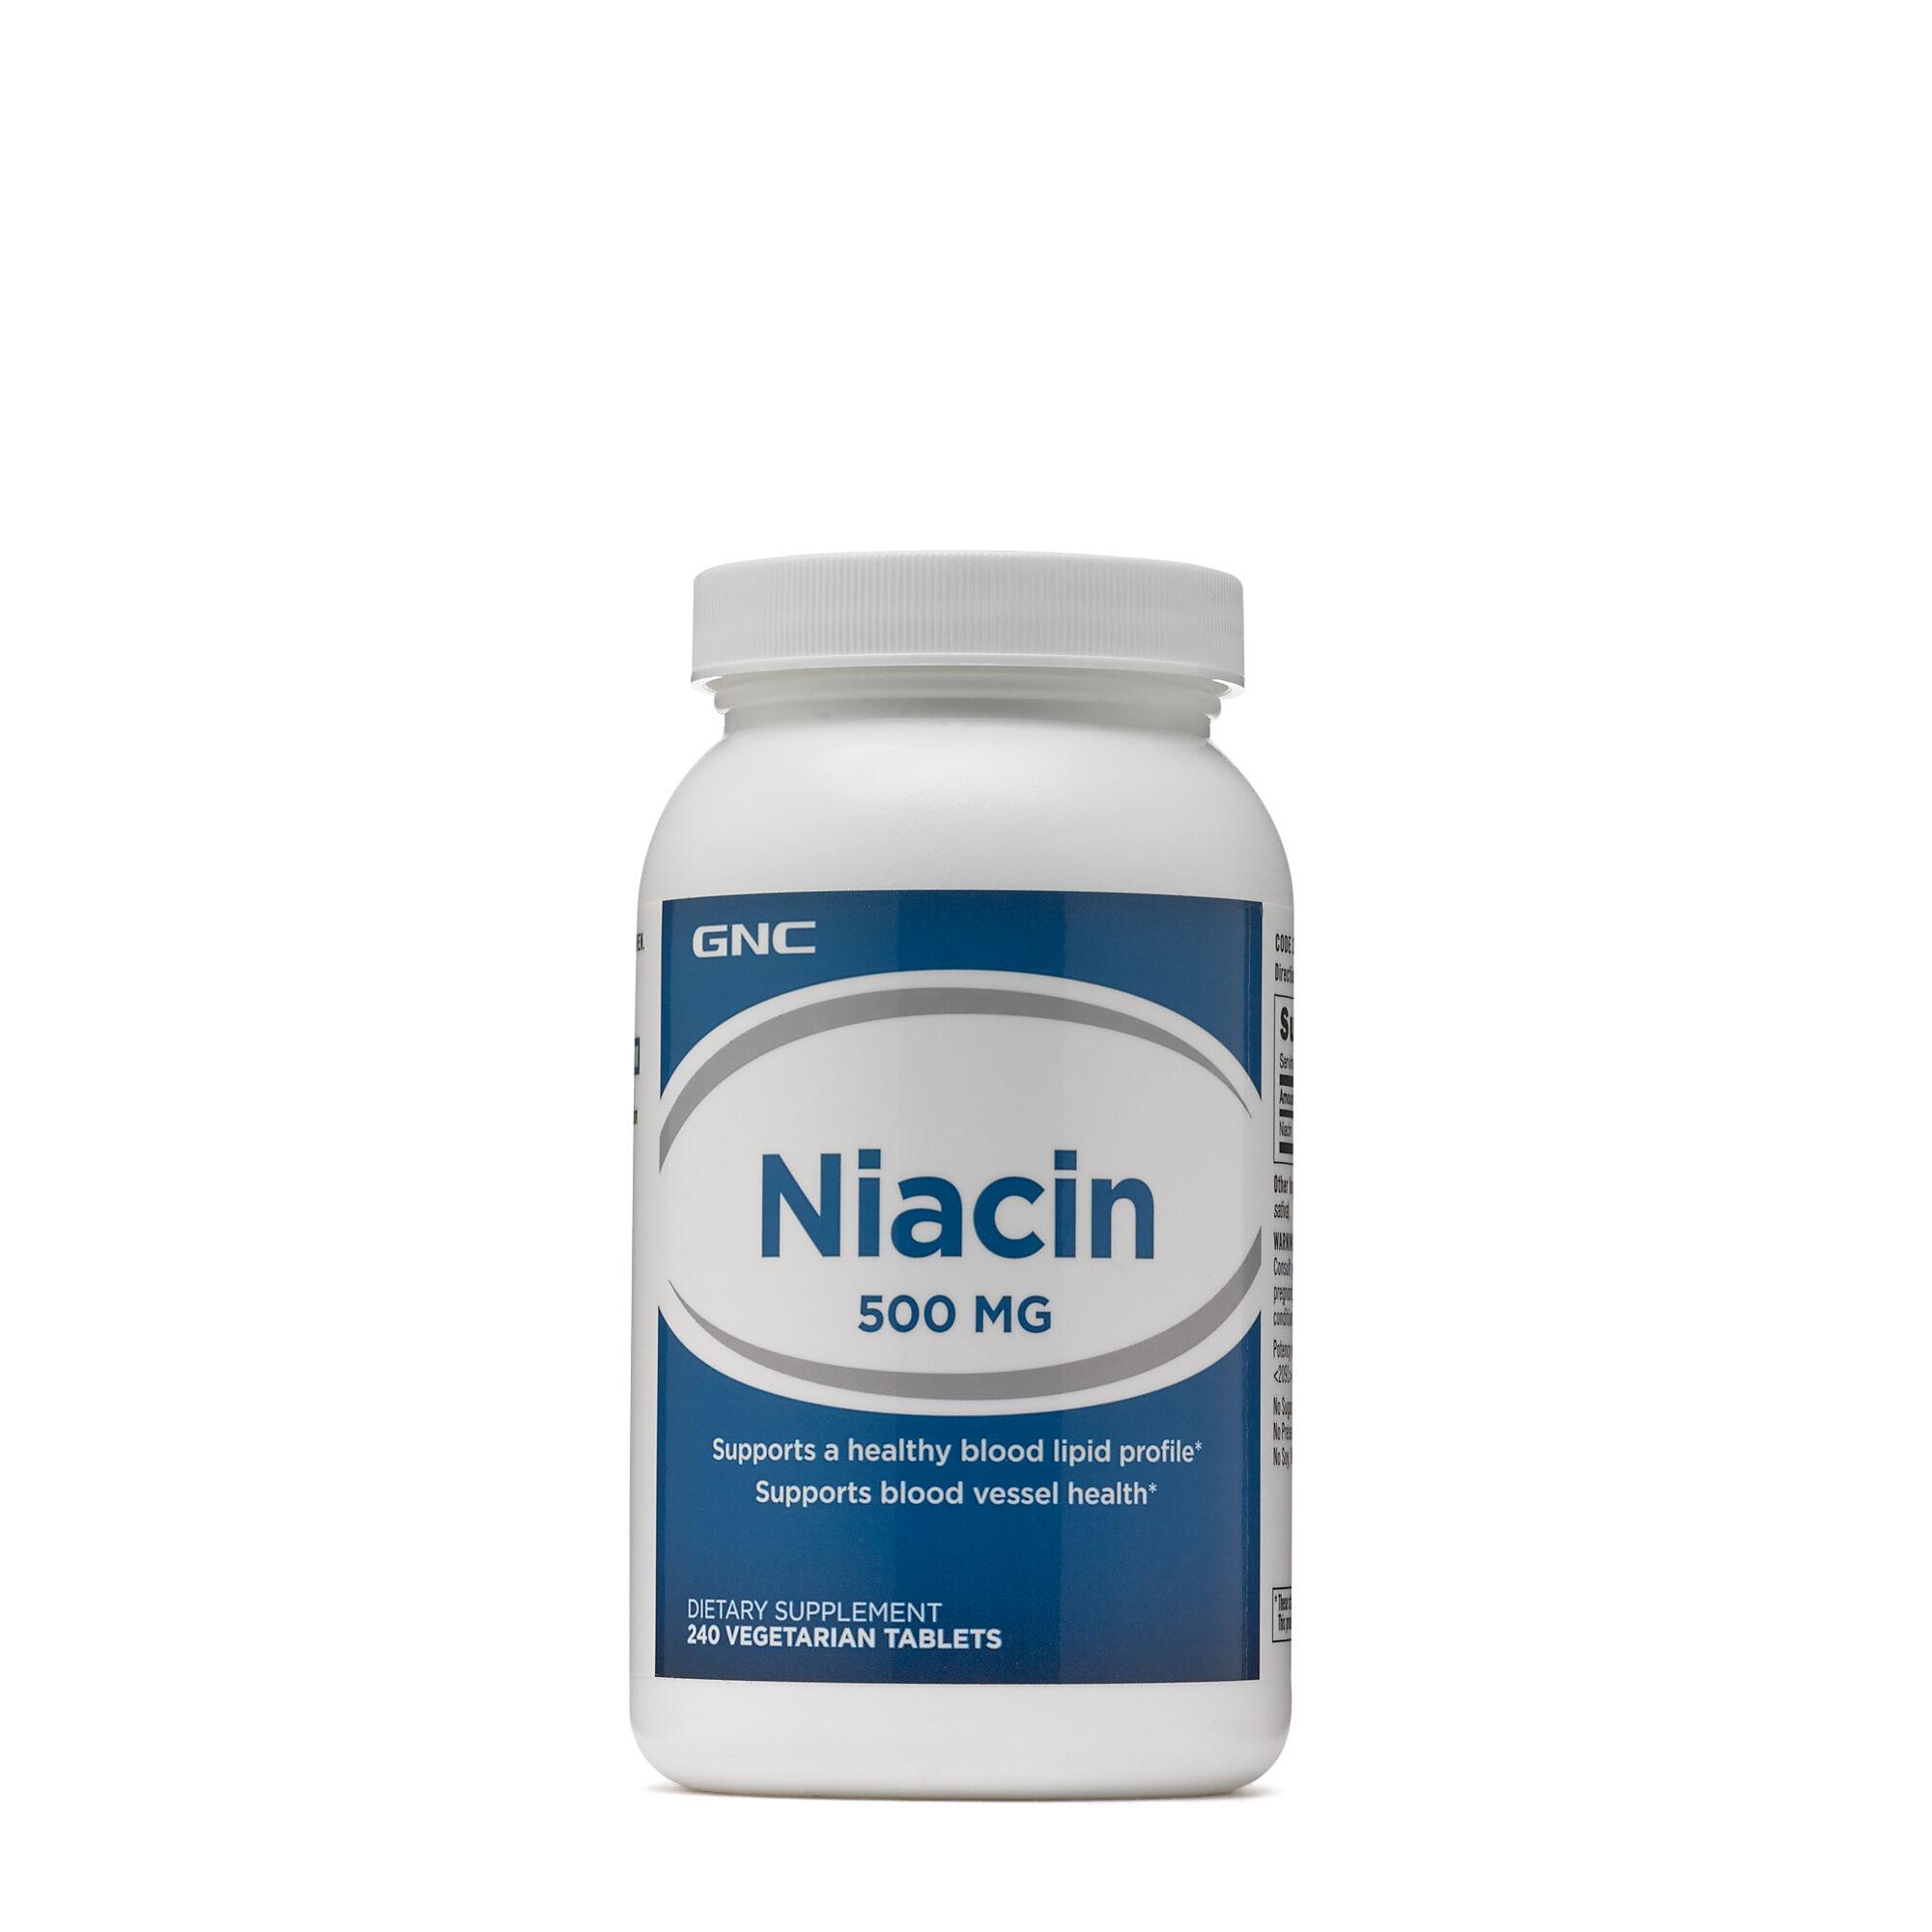 Gnc Niacin 500 Mg